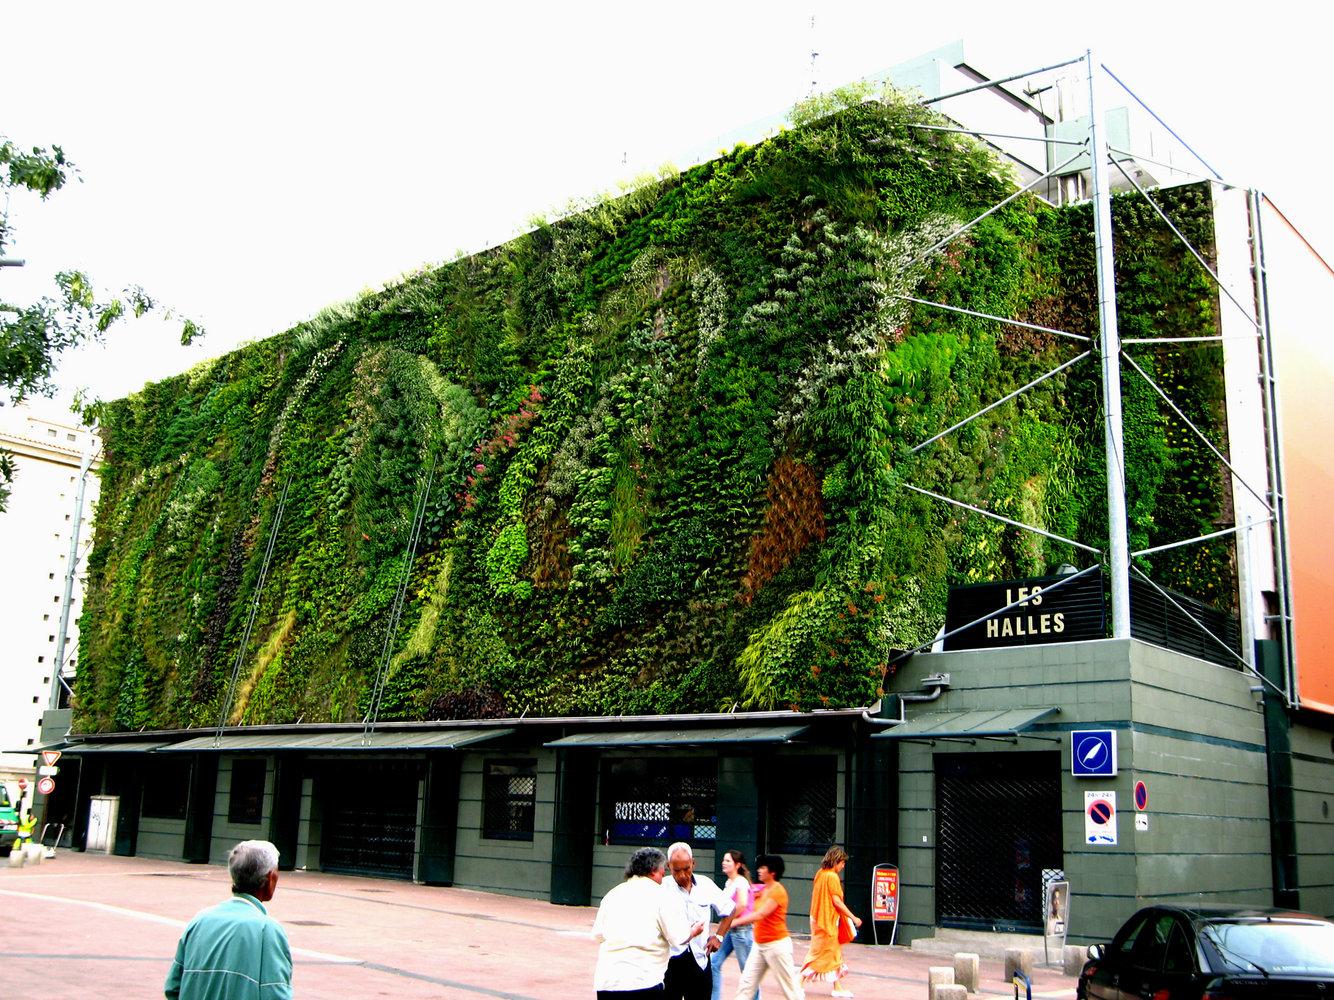 Halles avignon mur vegetal patrick blanc - Mur vegetal patrick blanc ...